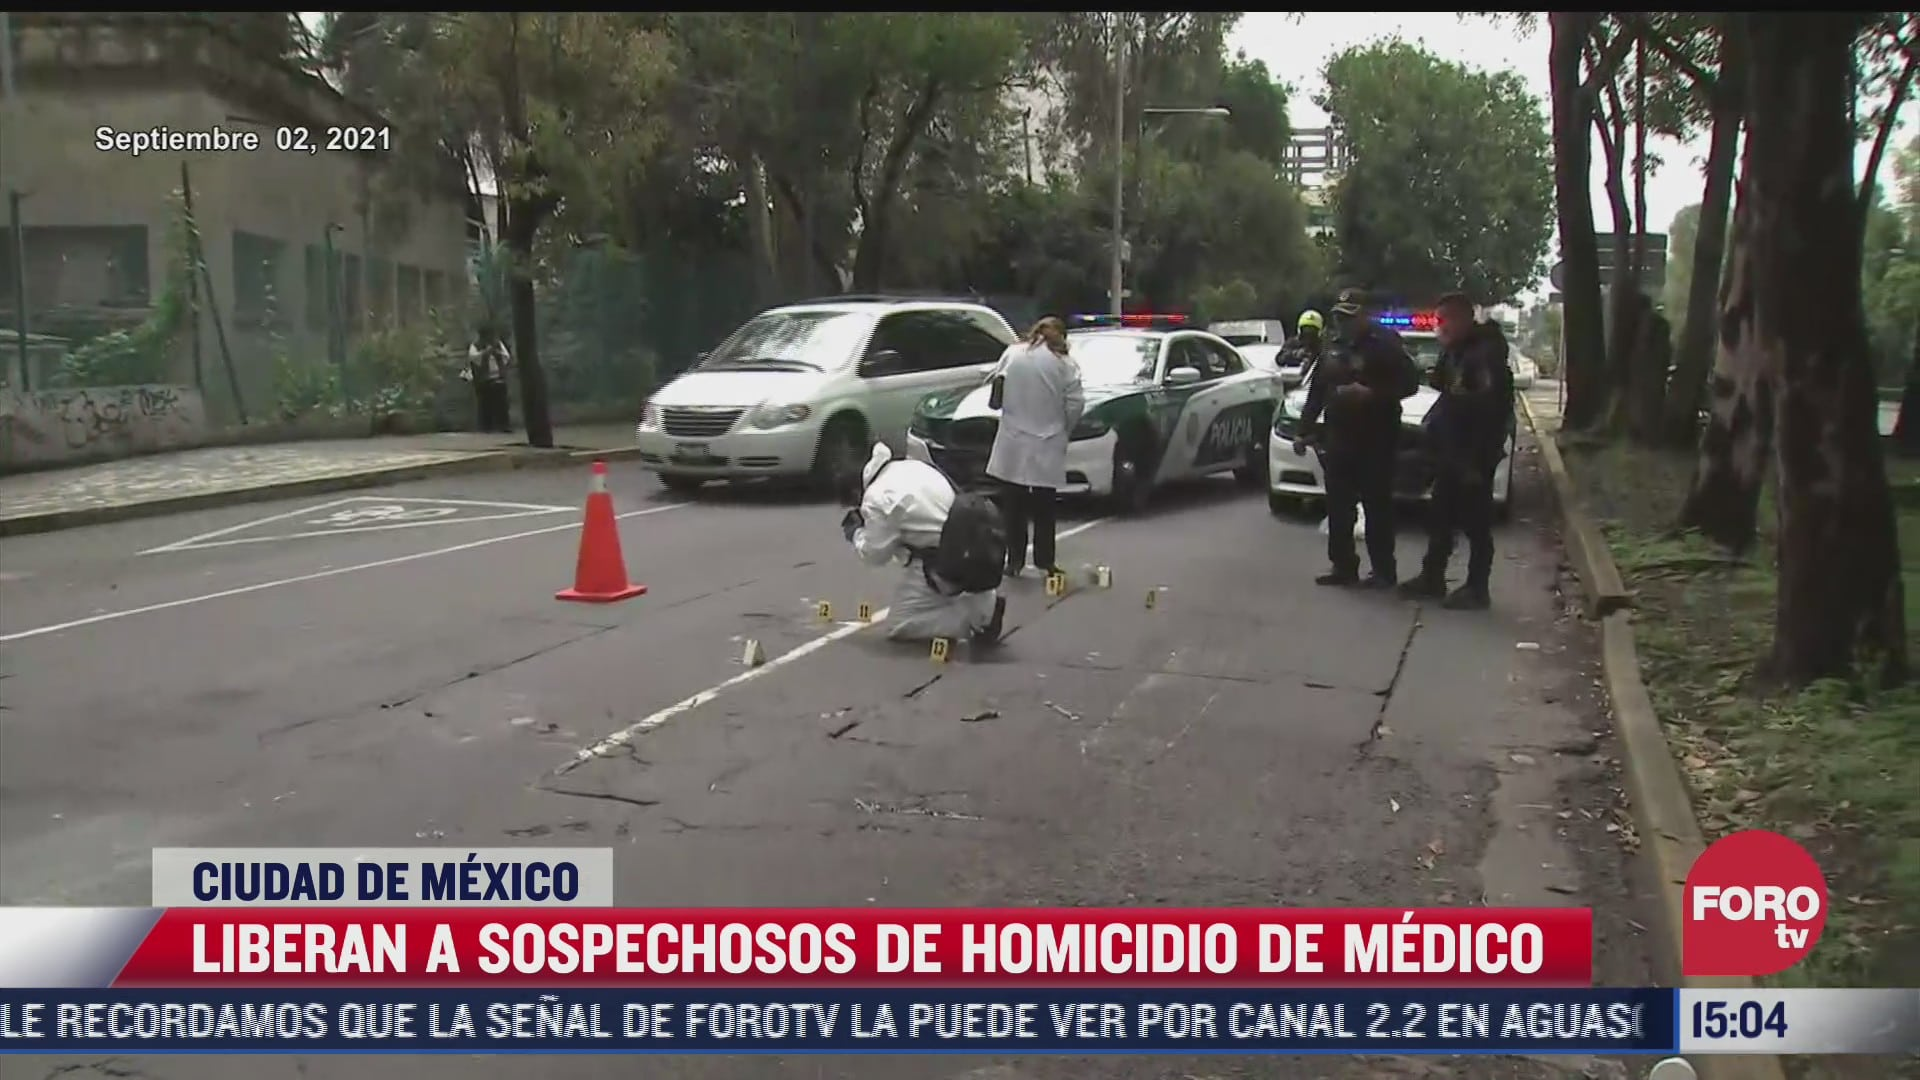 liberan a sospechosos de homicidio de medico en coyoacan